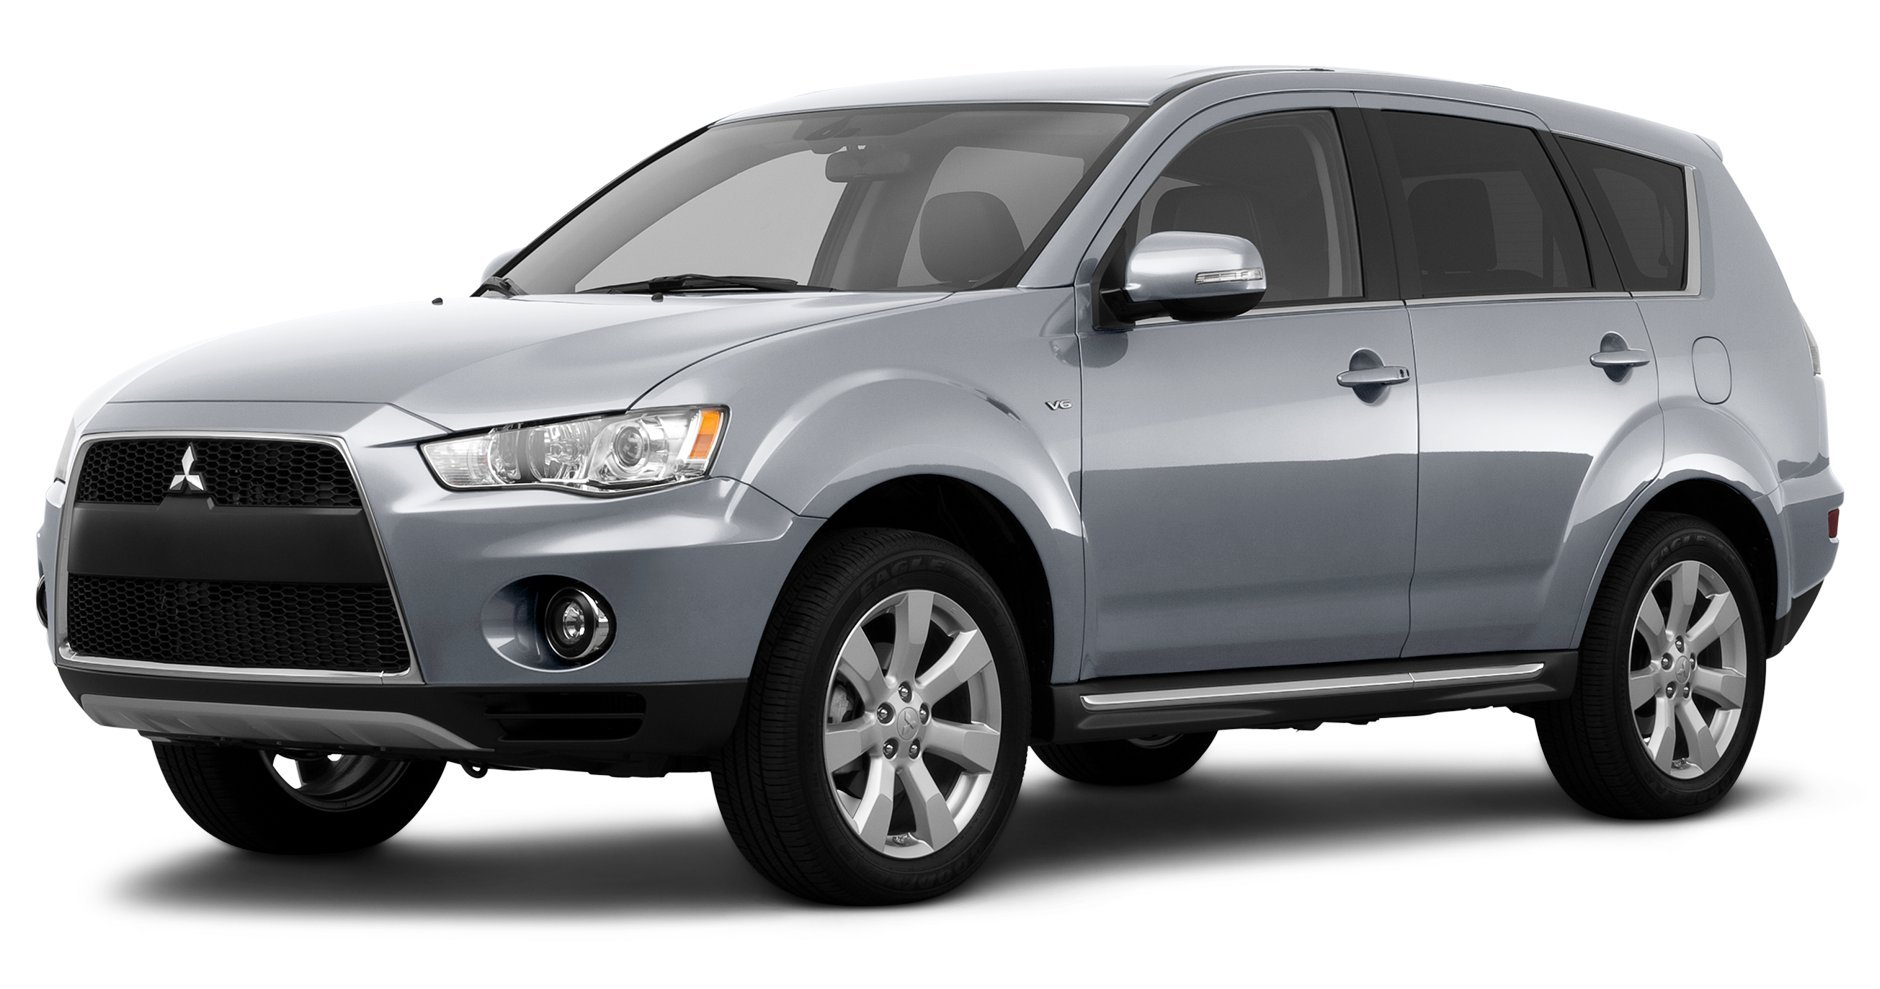 2011 Mazda CX 7 I SV, Front Wheel Drive 4 Door, 2011 Mitsubishi Outlander  ES, 2 Wheel Drive 4 Door ...